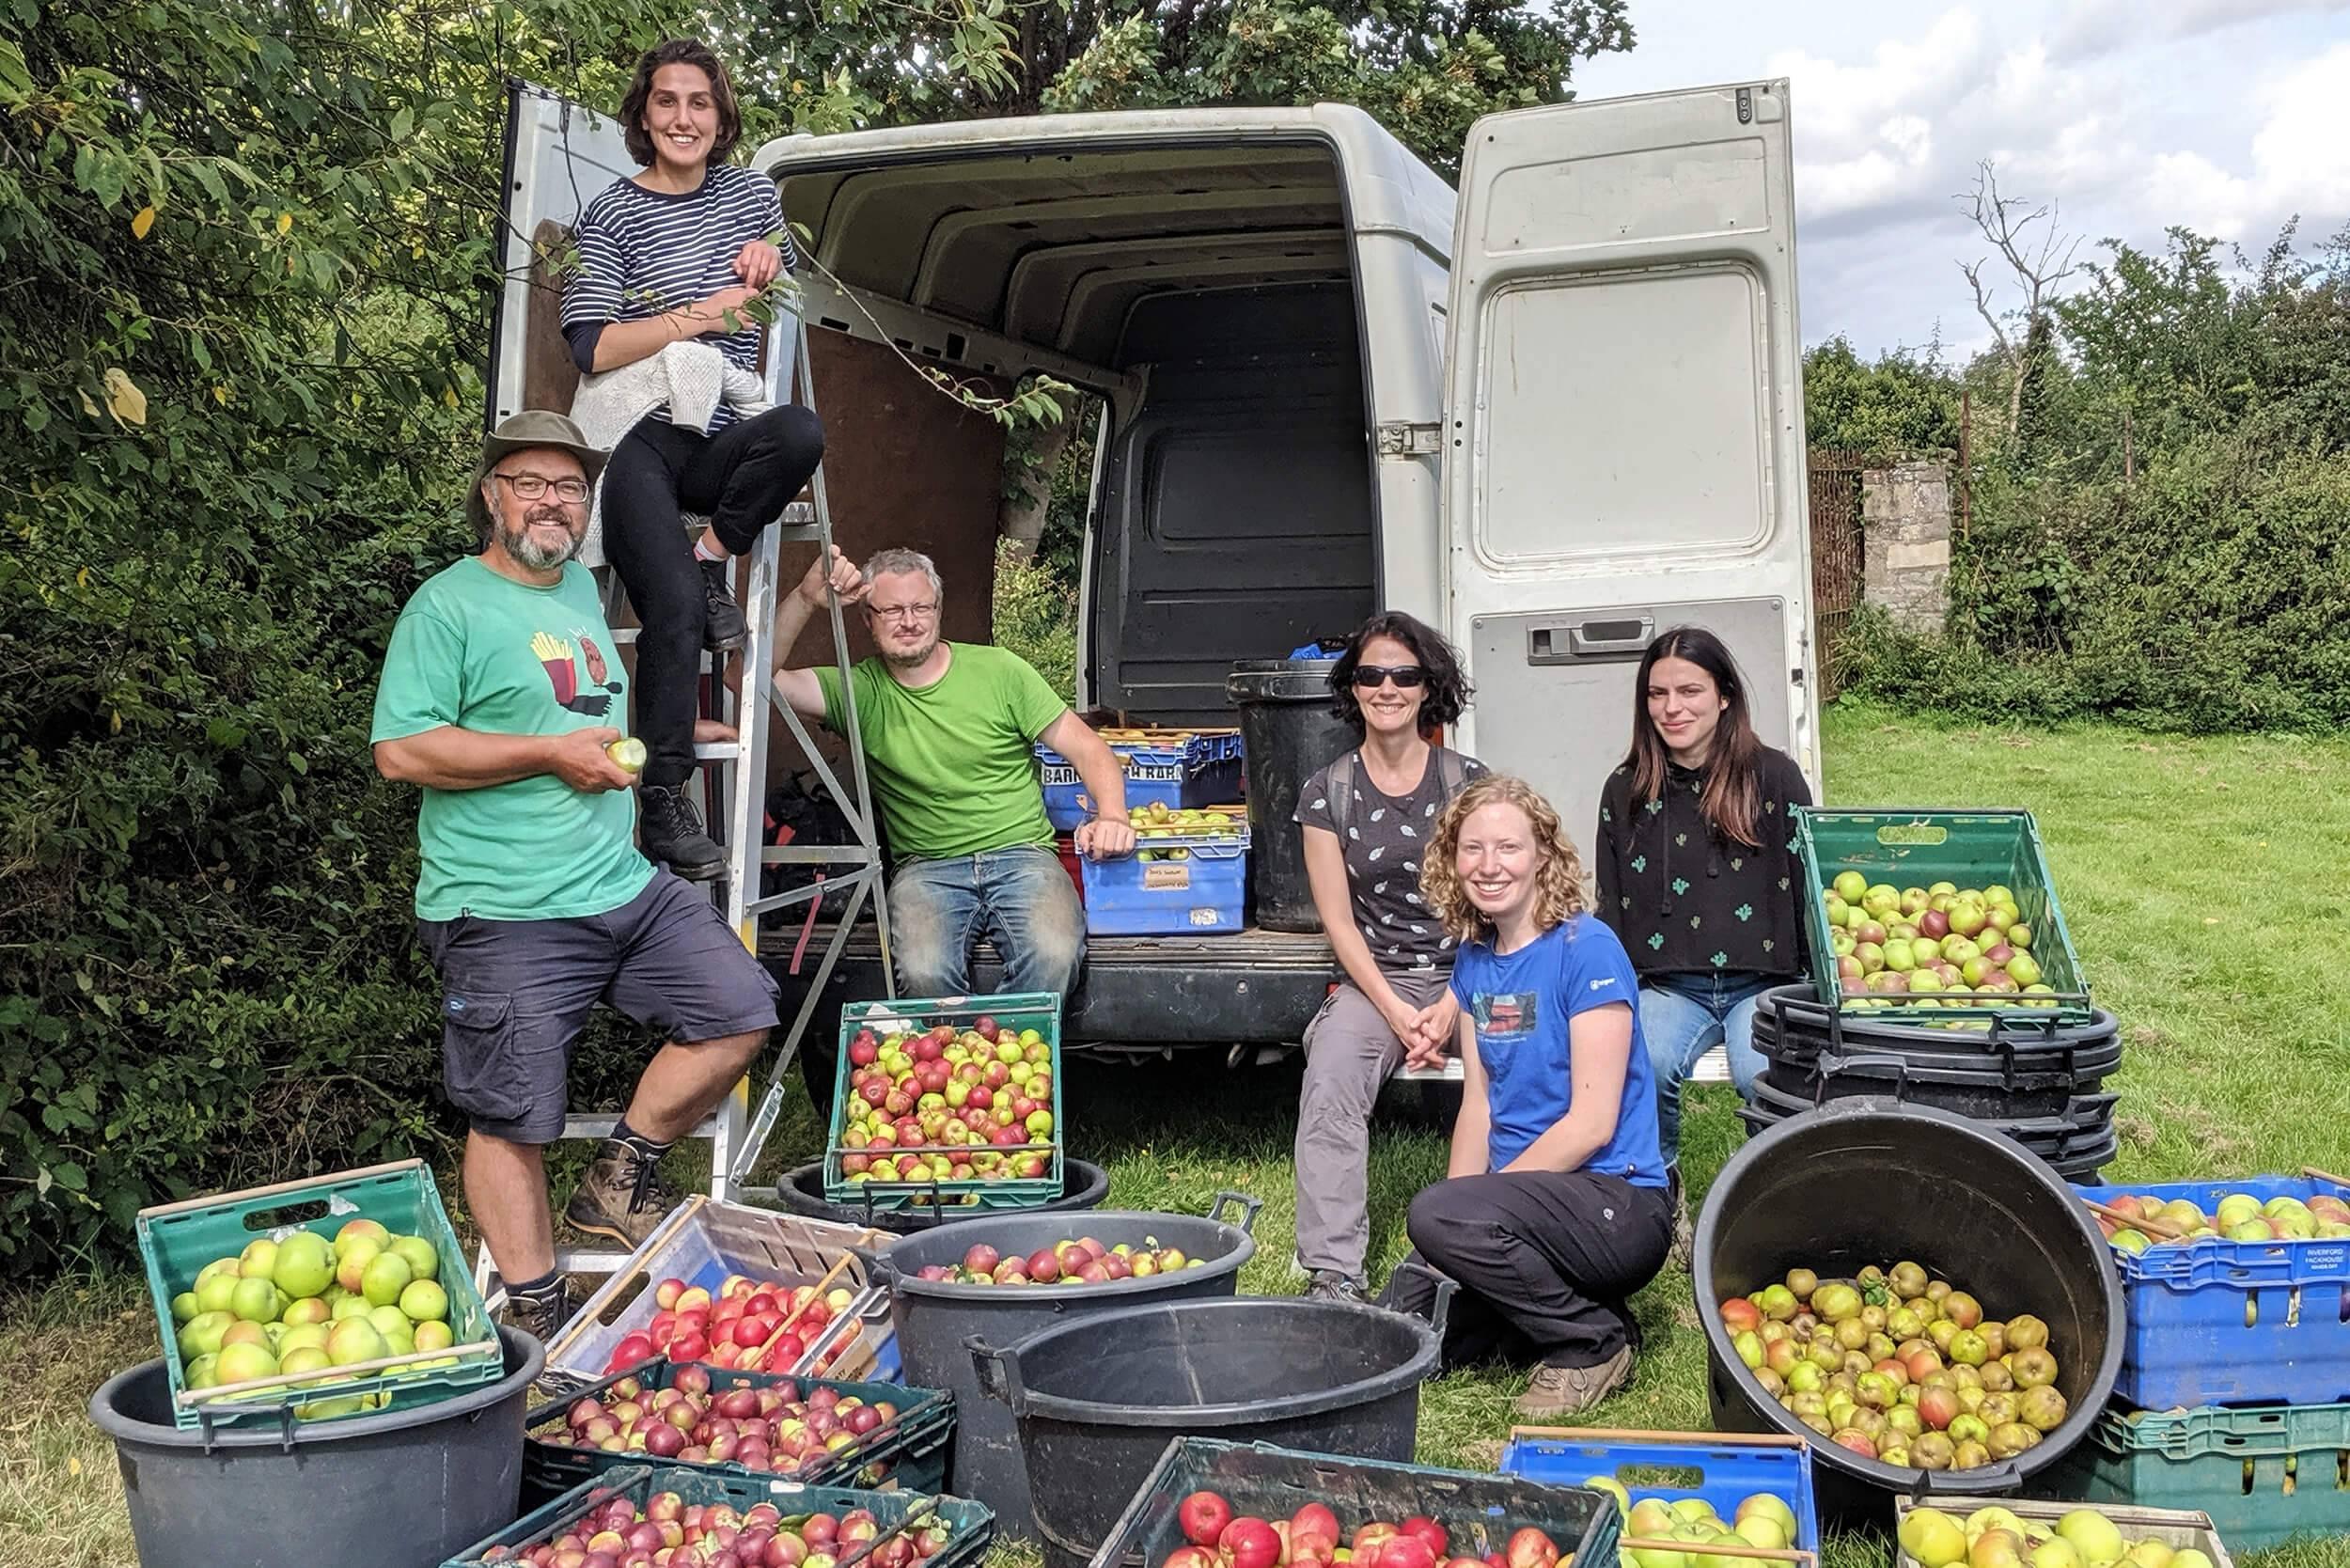 Sheffield Apple Harvest - Juice, Regather